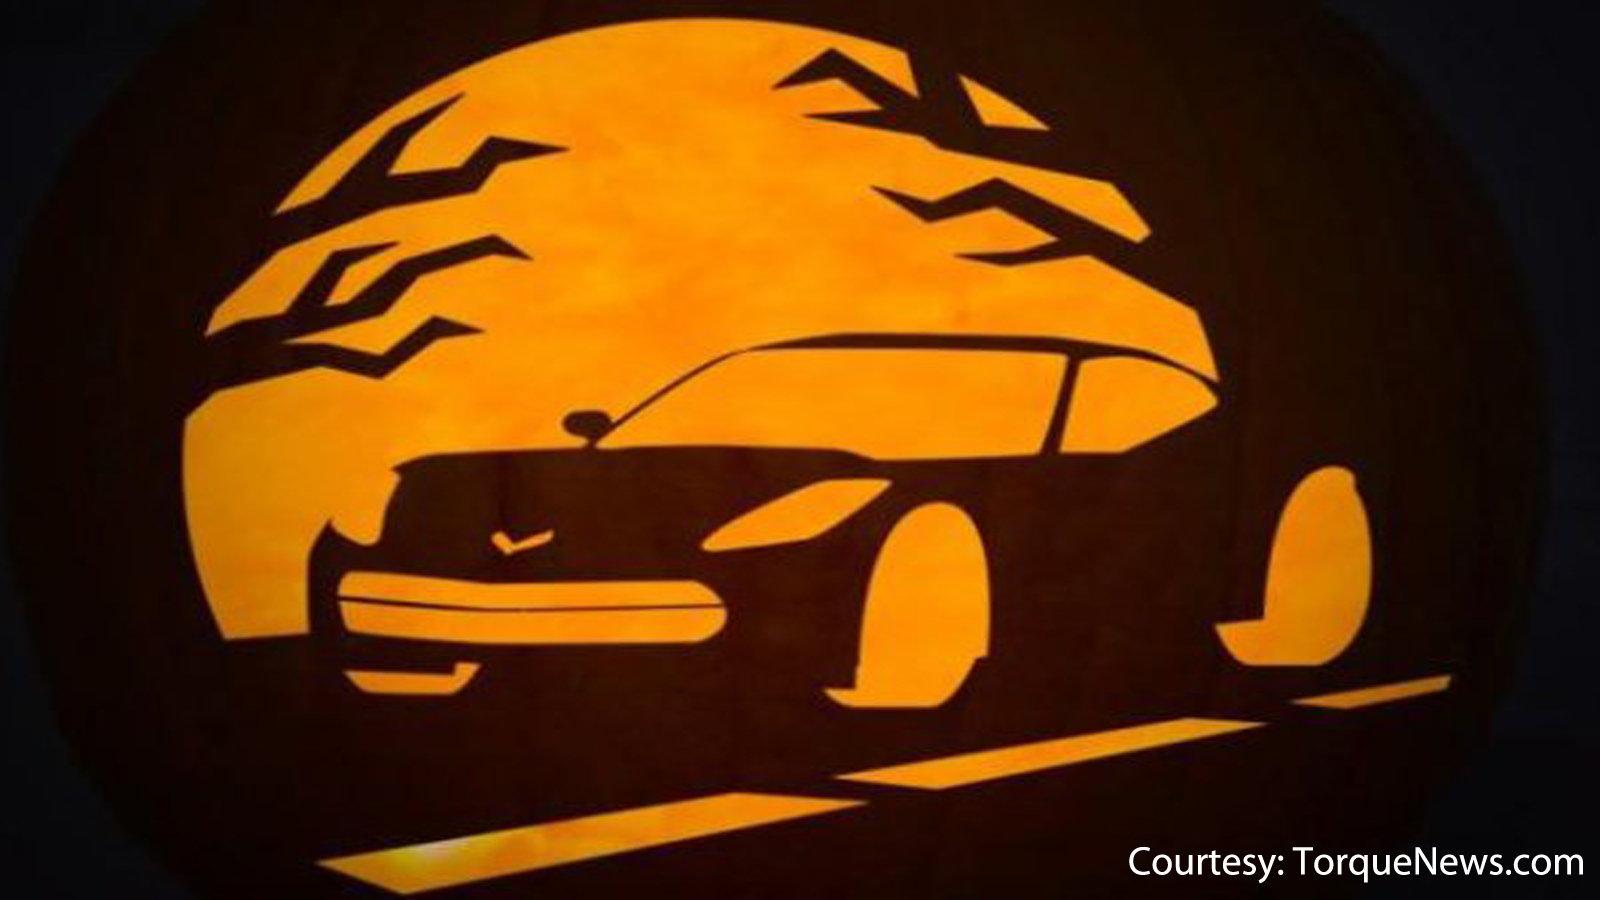 Corvette pumpkin stencil